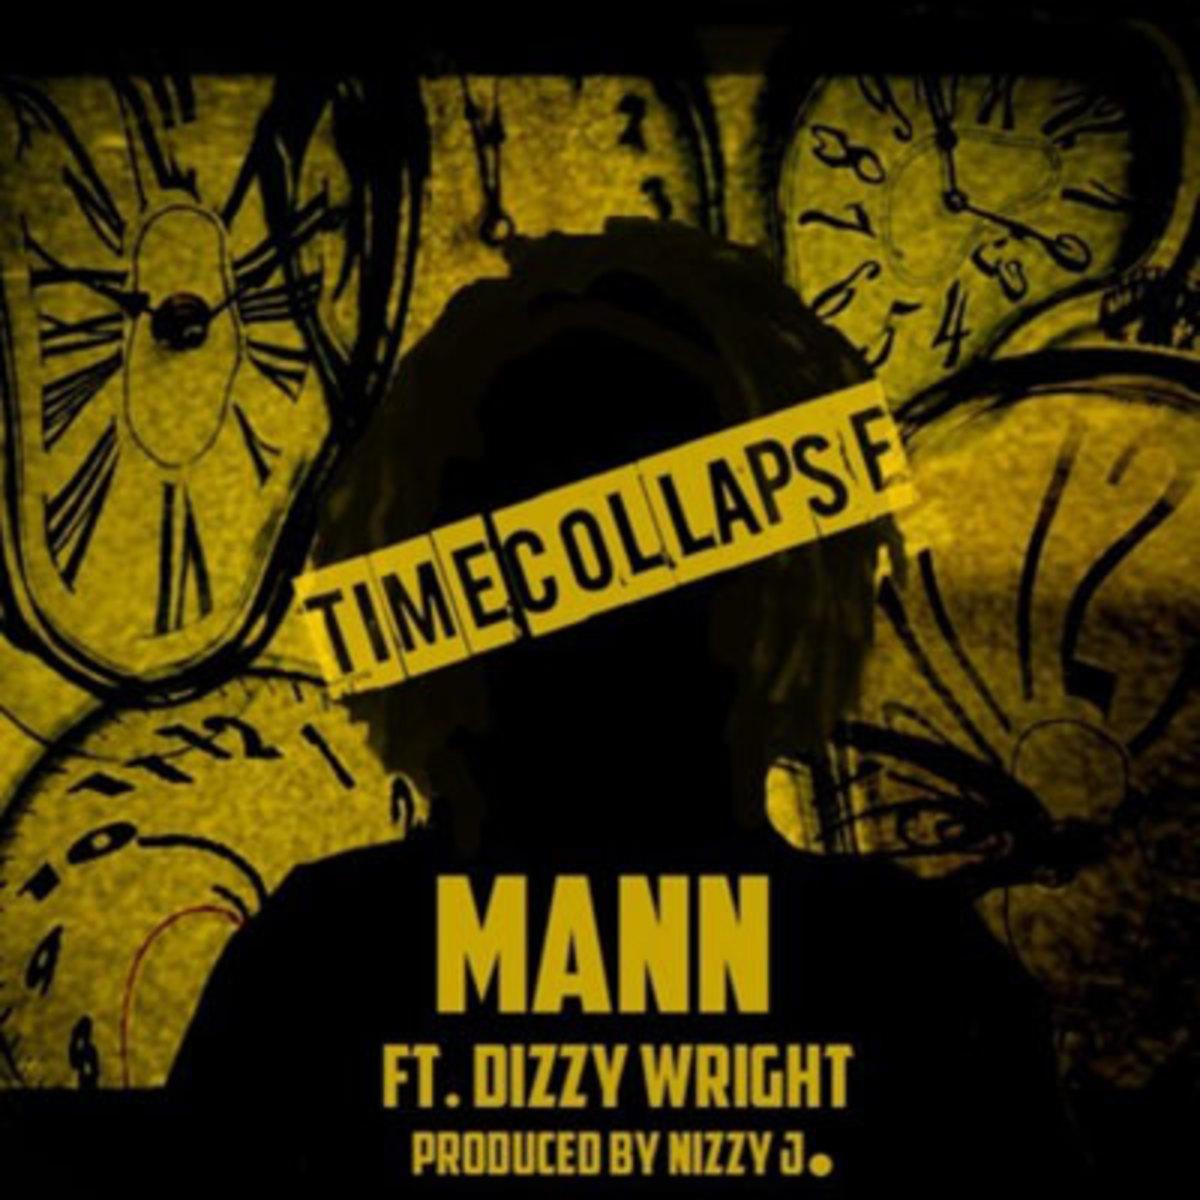 mann-timecollapse.jpg